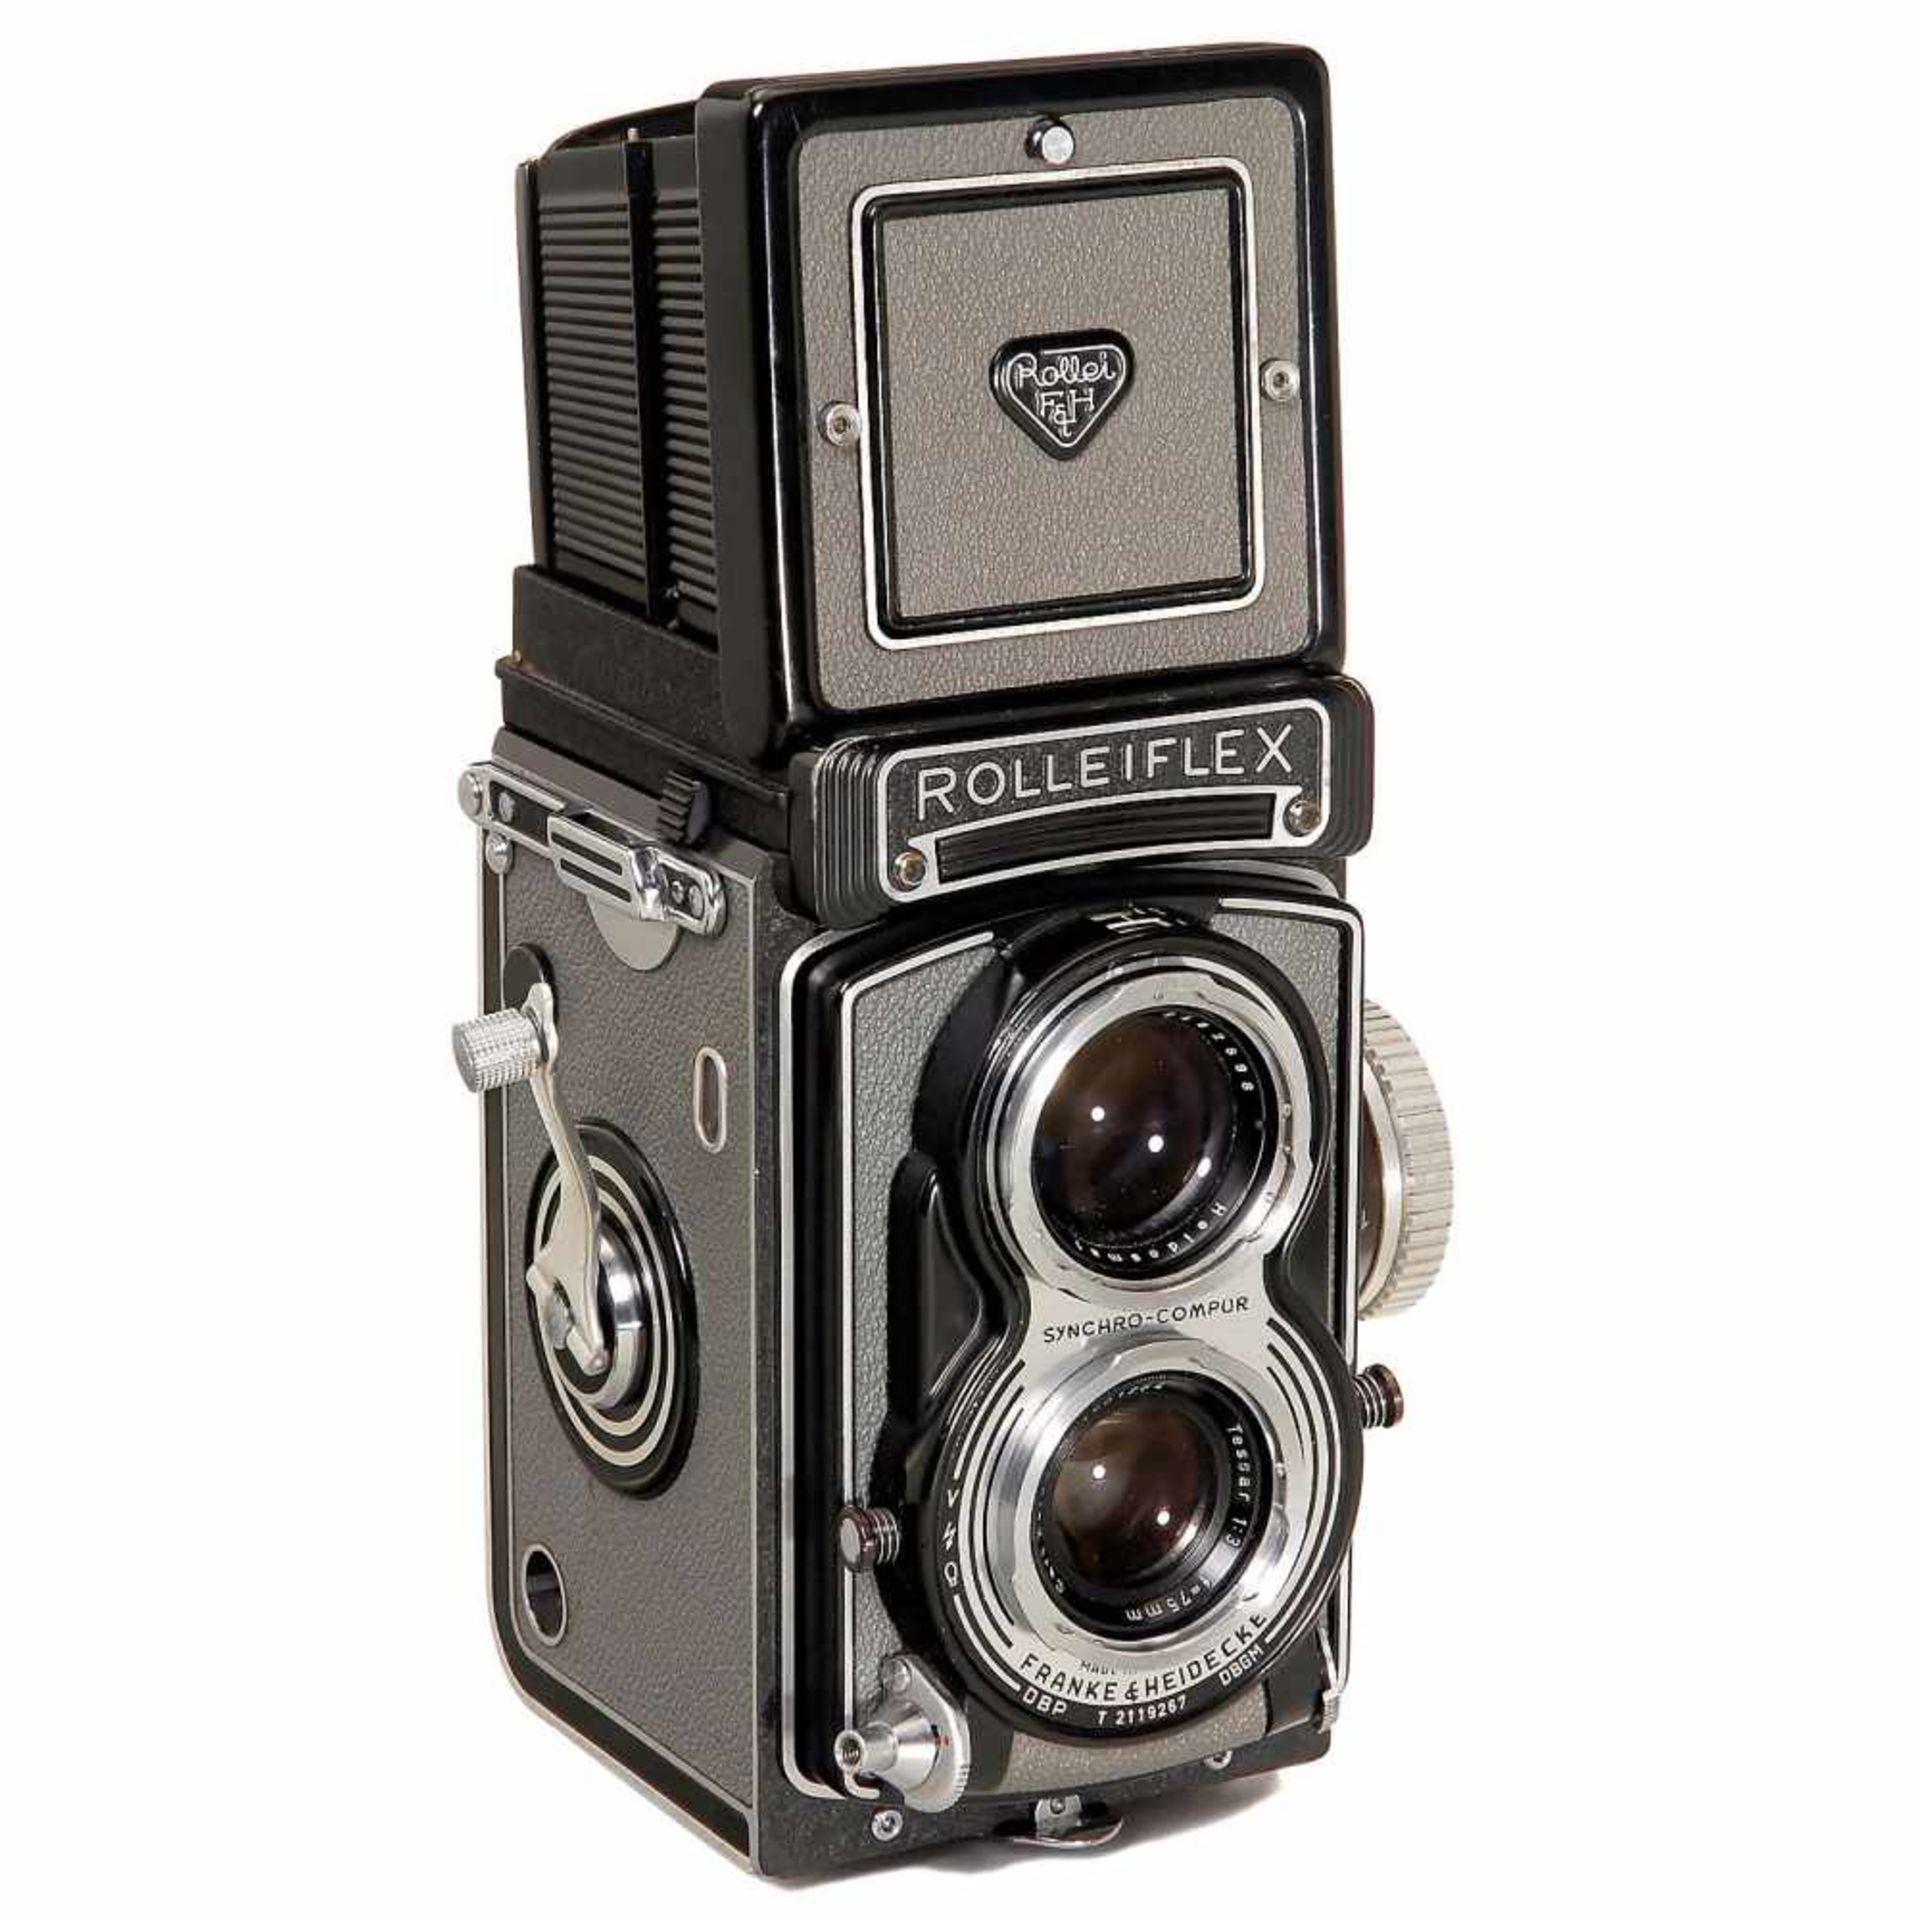 Rolleiflex T (First Model), 1958Franke & Heidecke, Braunschweig. No. T 2119267, first model in grey,